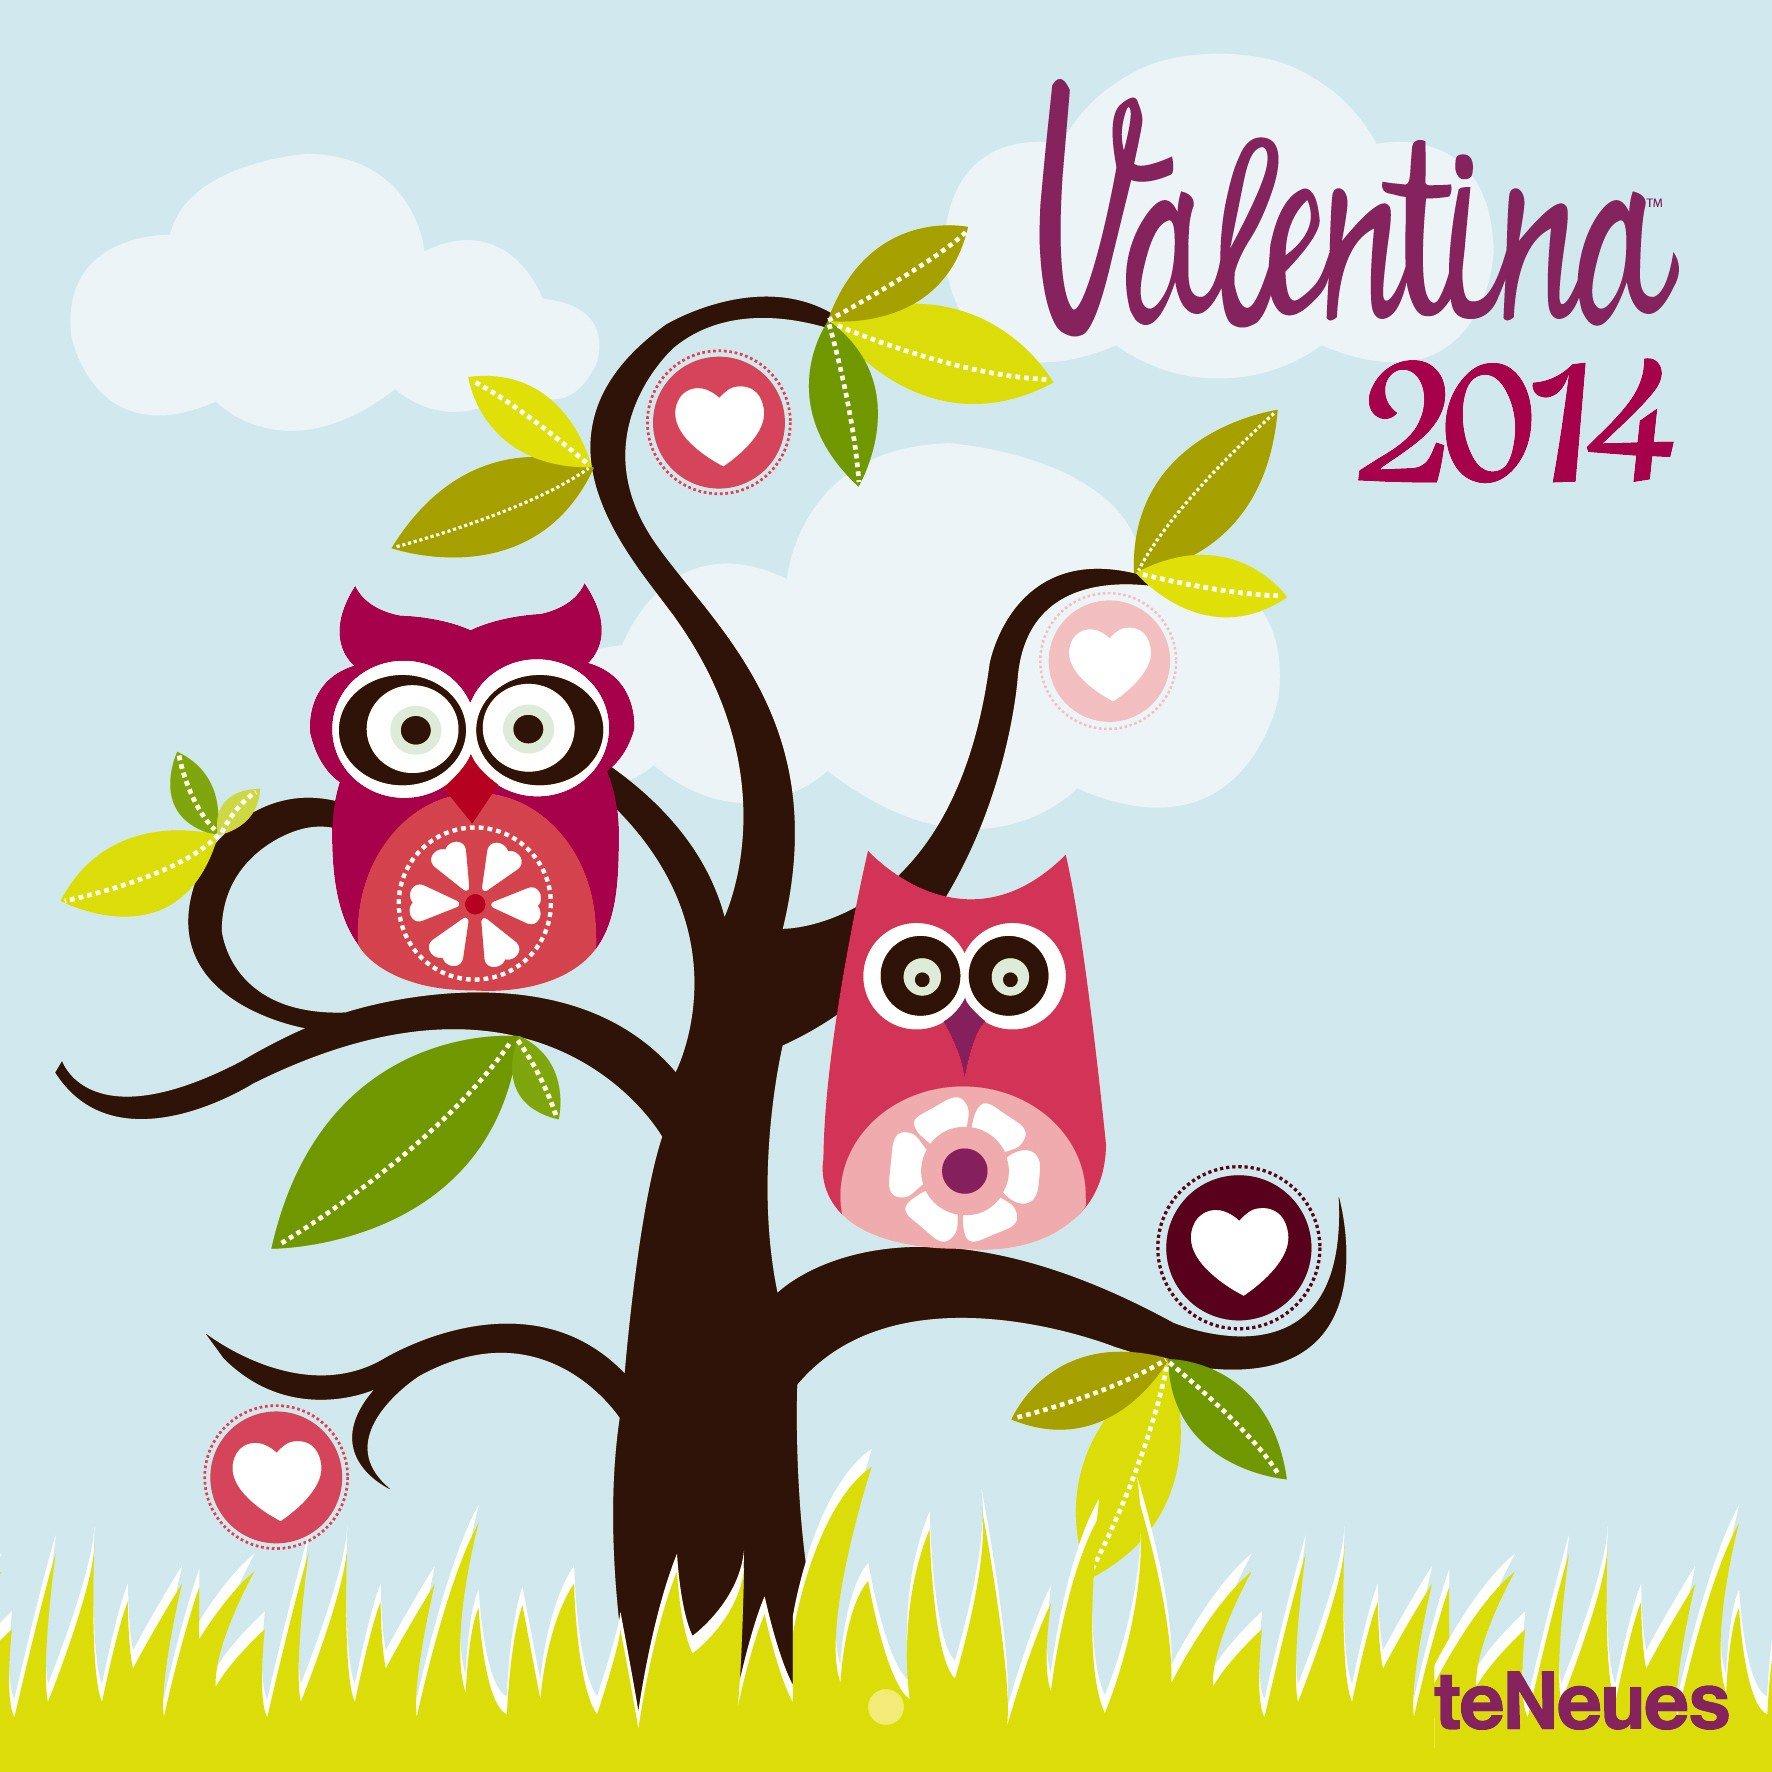 Valentina Ramos 2014 Broschürenkalender